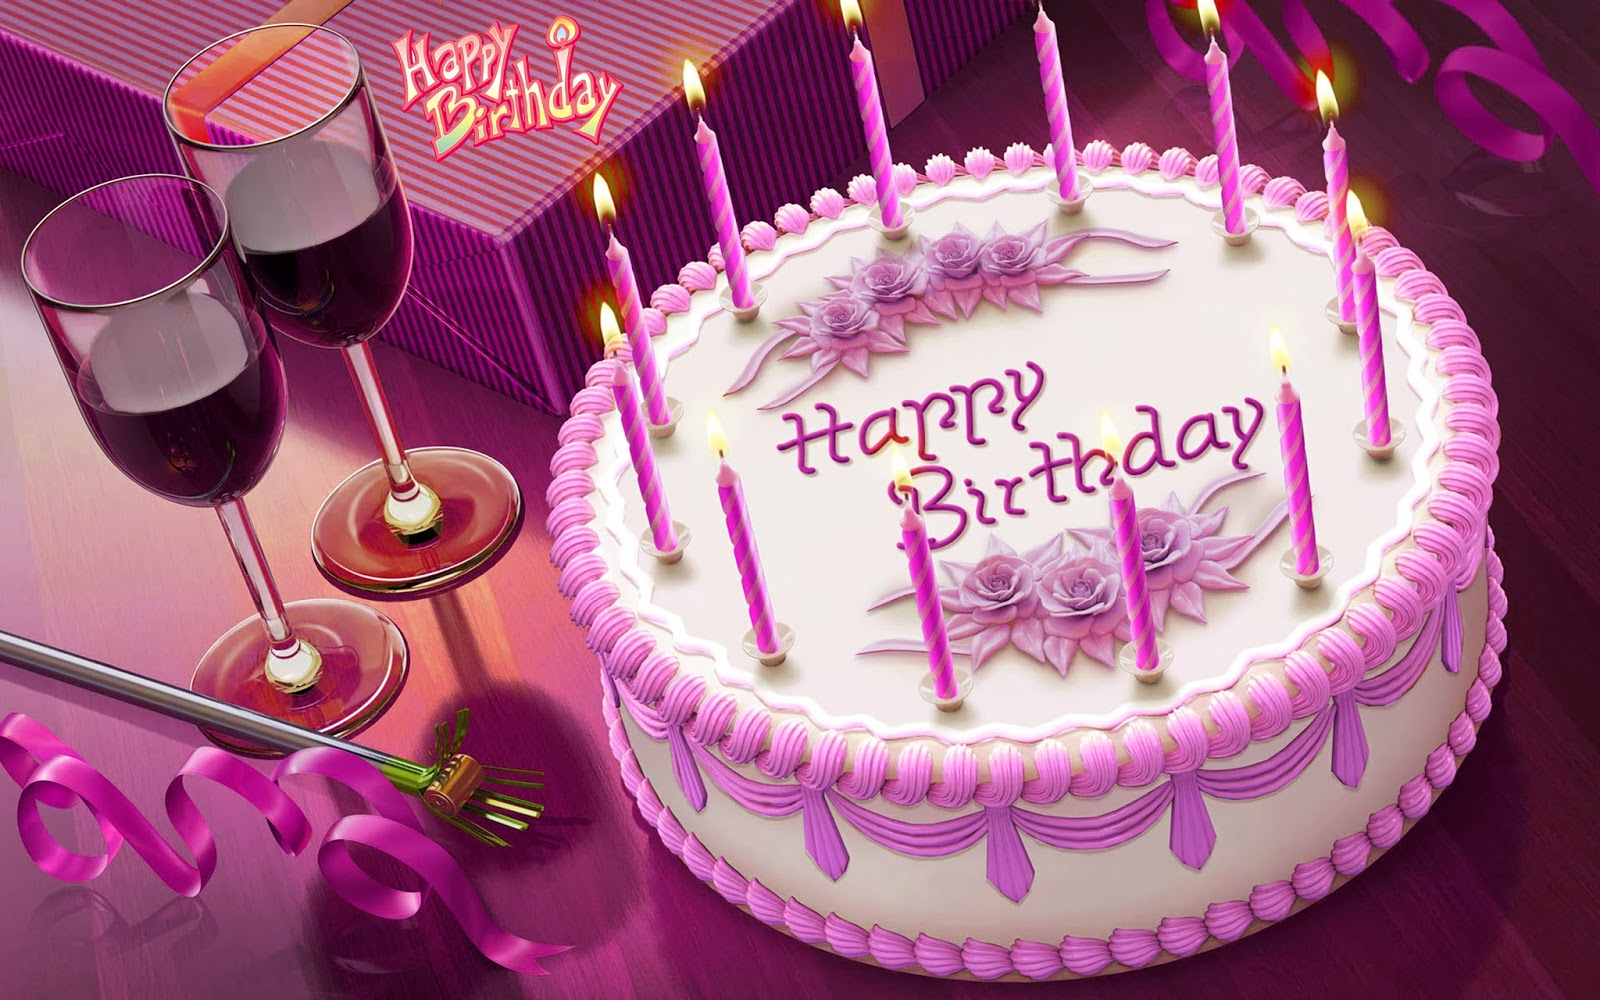 Happy-Birthday-Candles-Cake-Image-HD